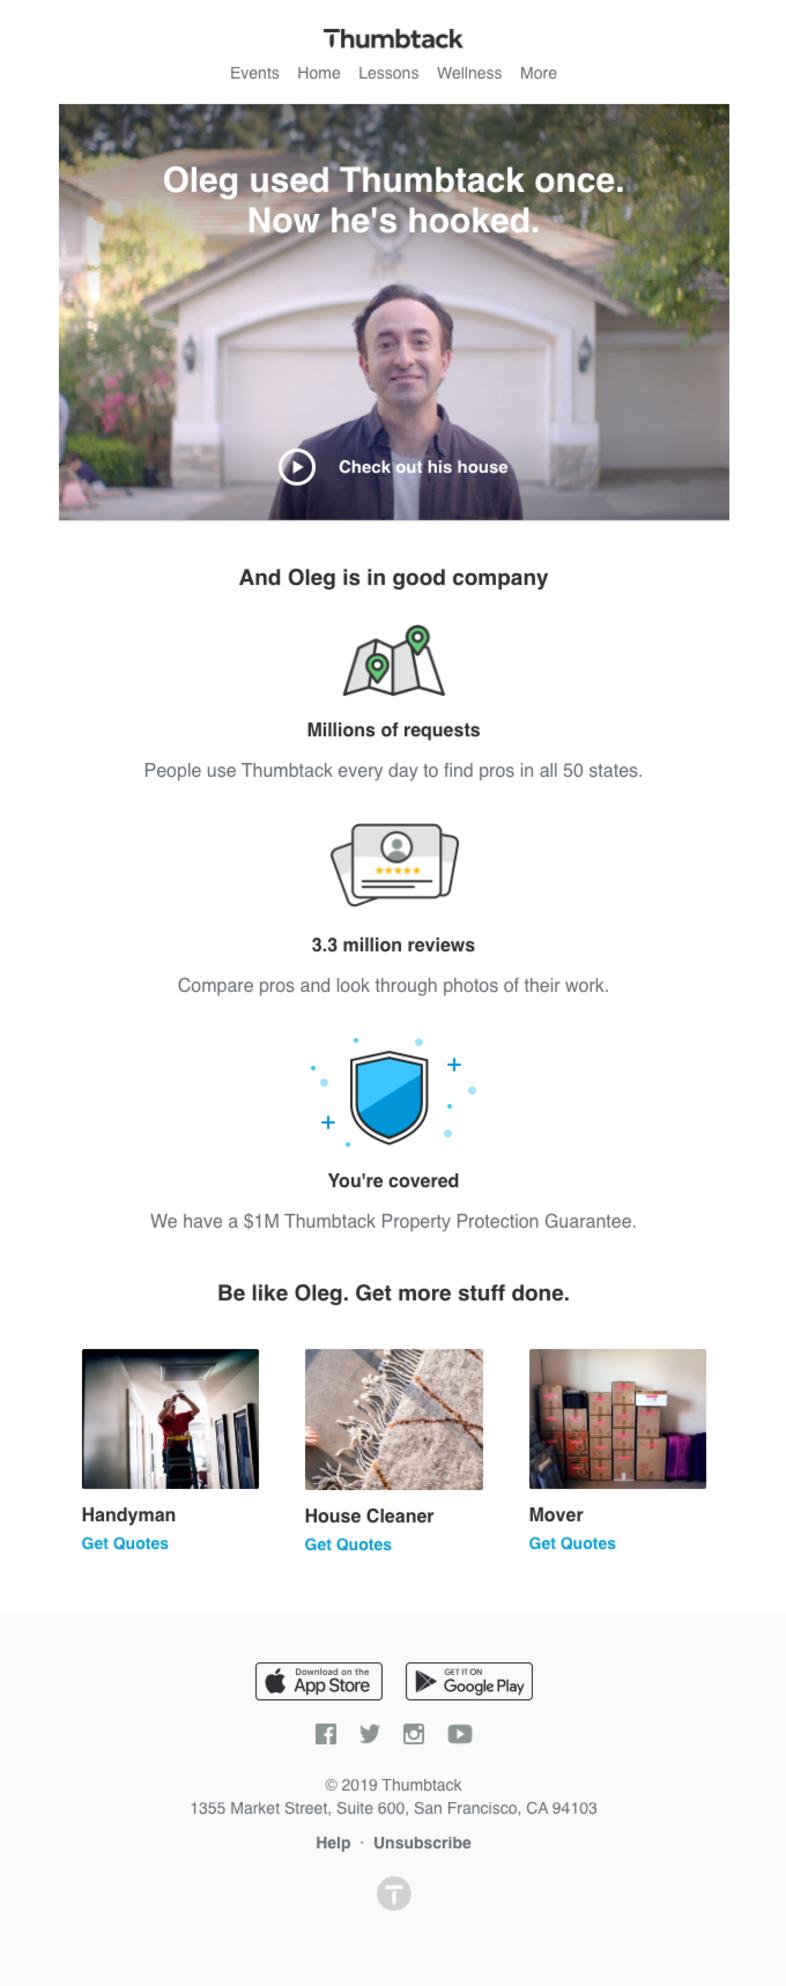 Branding email de Thumbtack